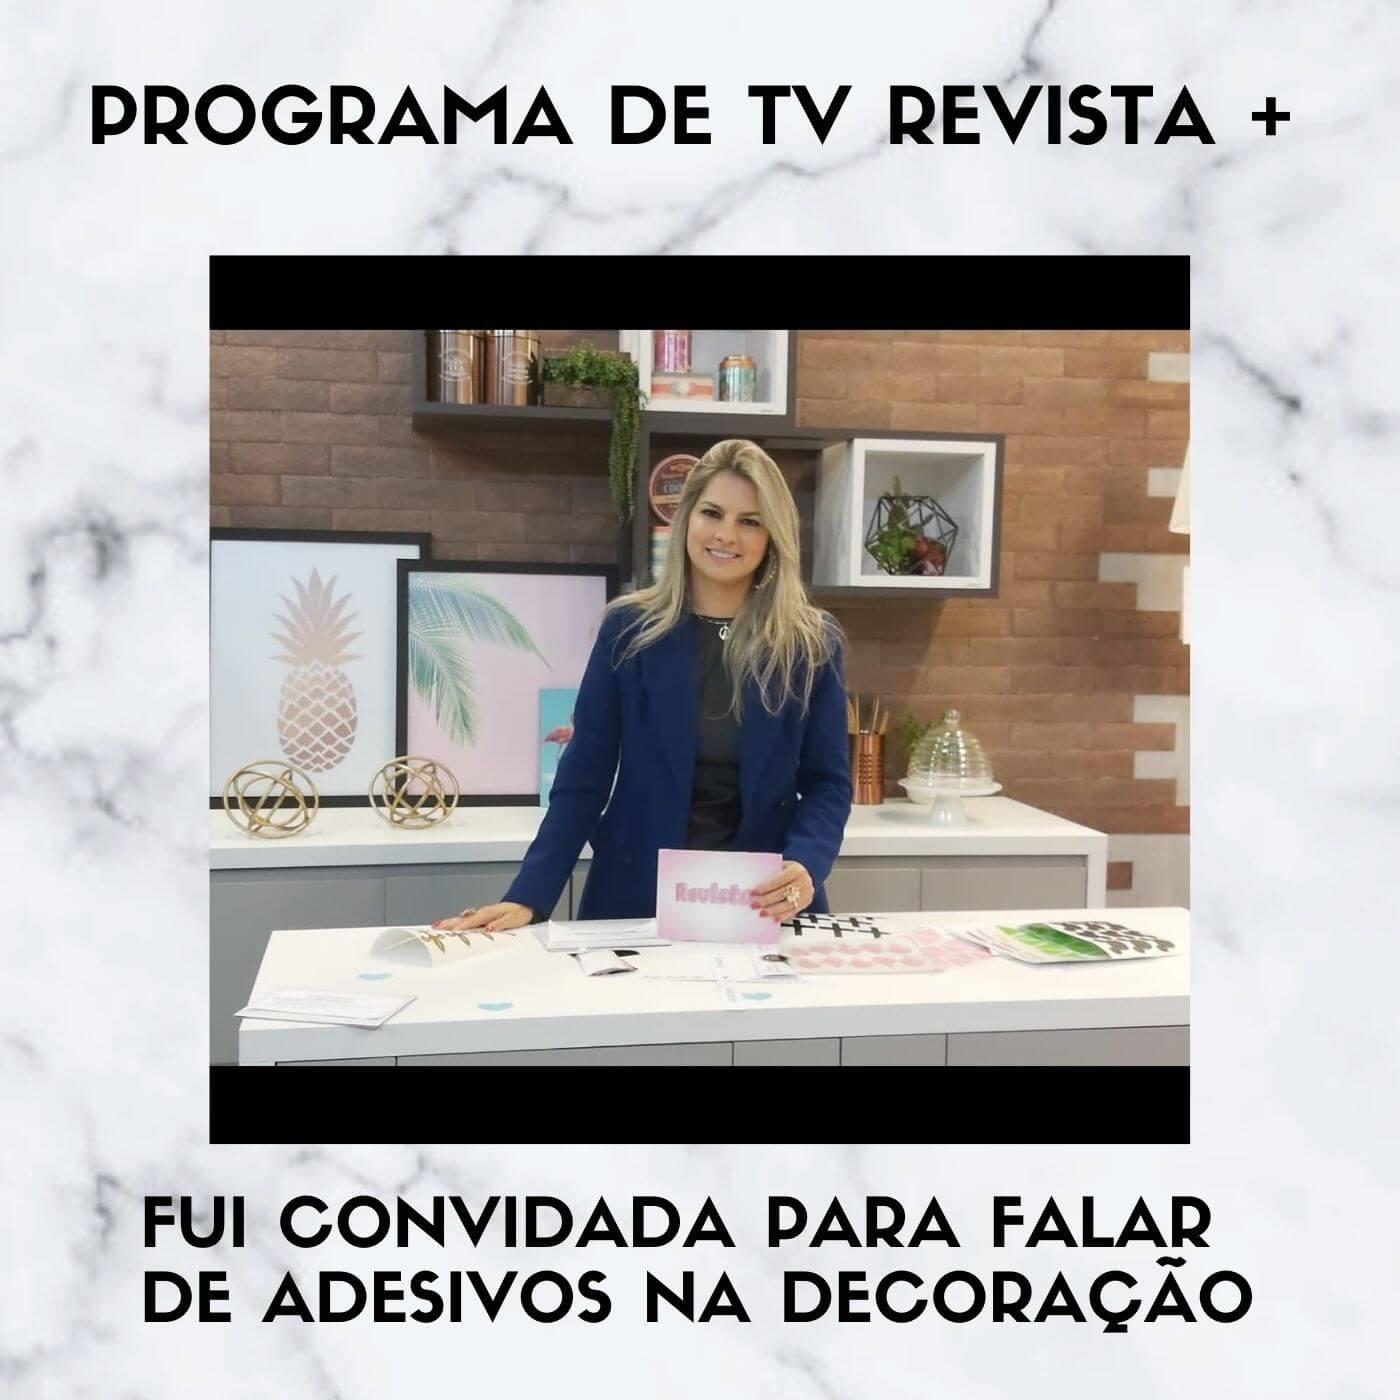 AMOR PALAVRA ADESIVA